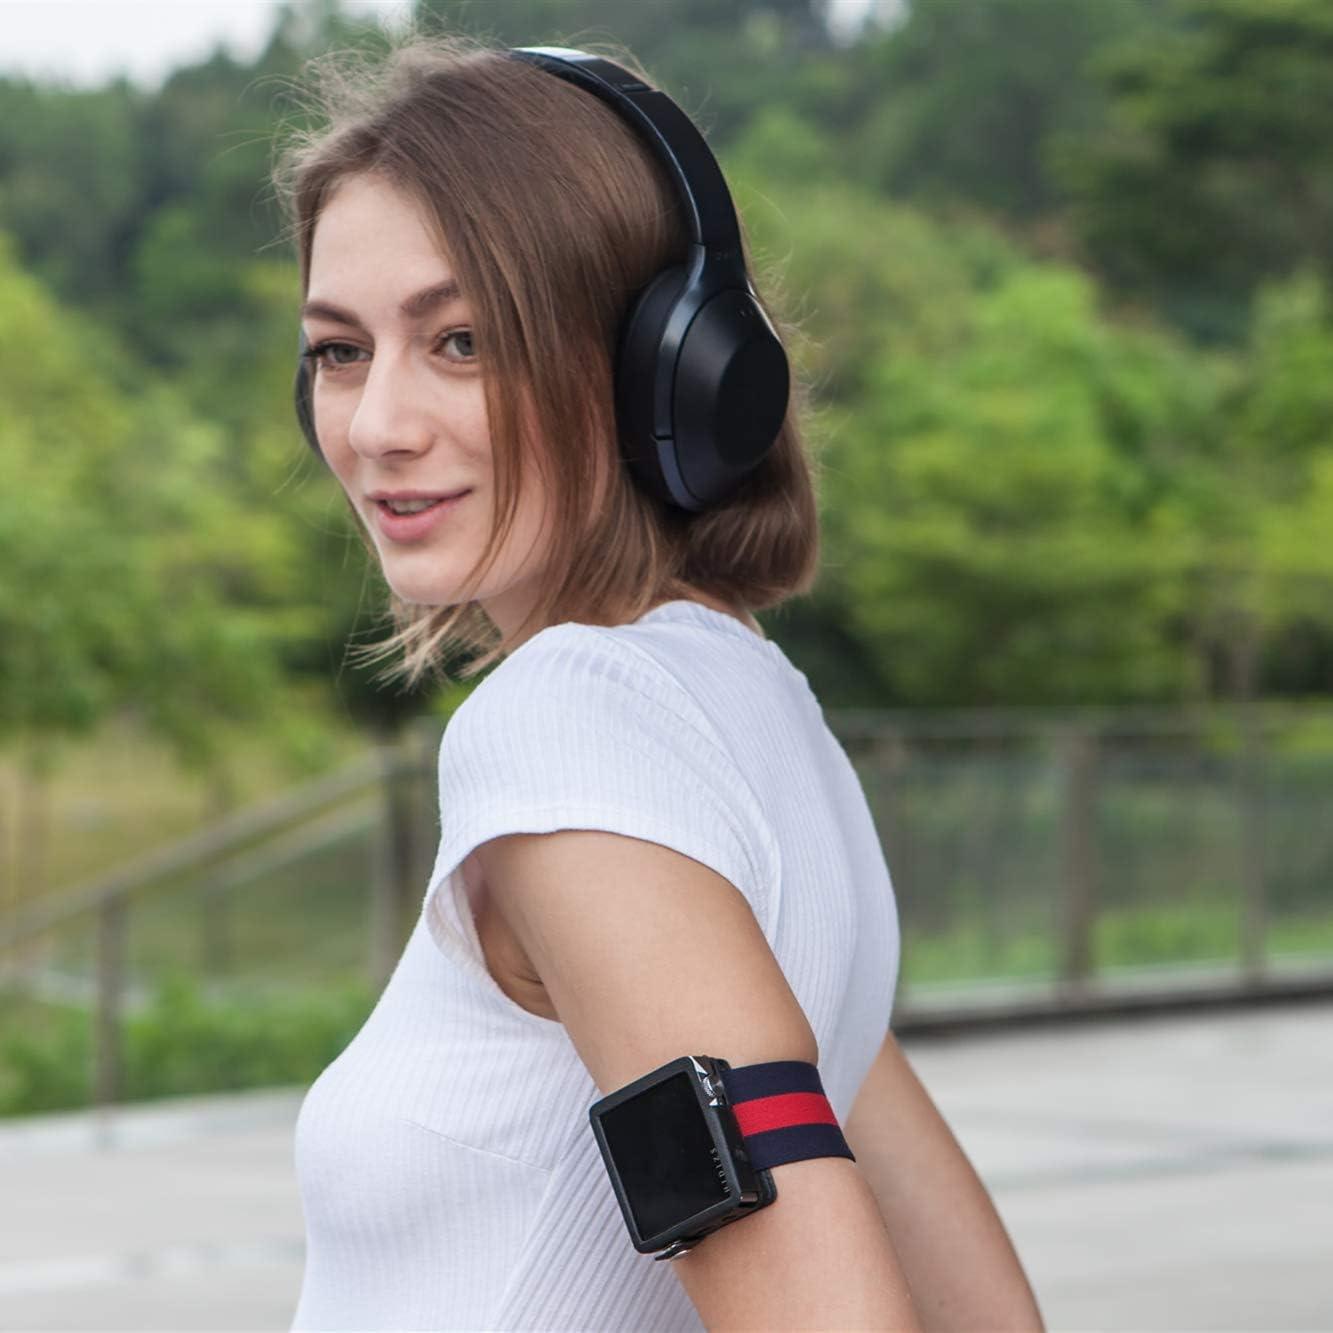 HIDIZS AP80 Ultraportable HiFi Music Player Bluetooth MP3 Player High Resolution Audio Player Blau